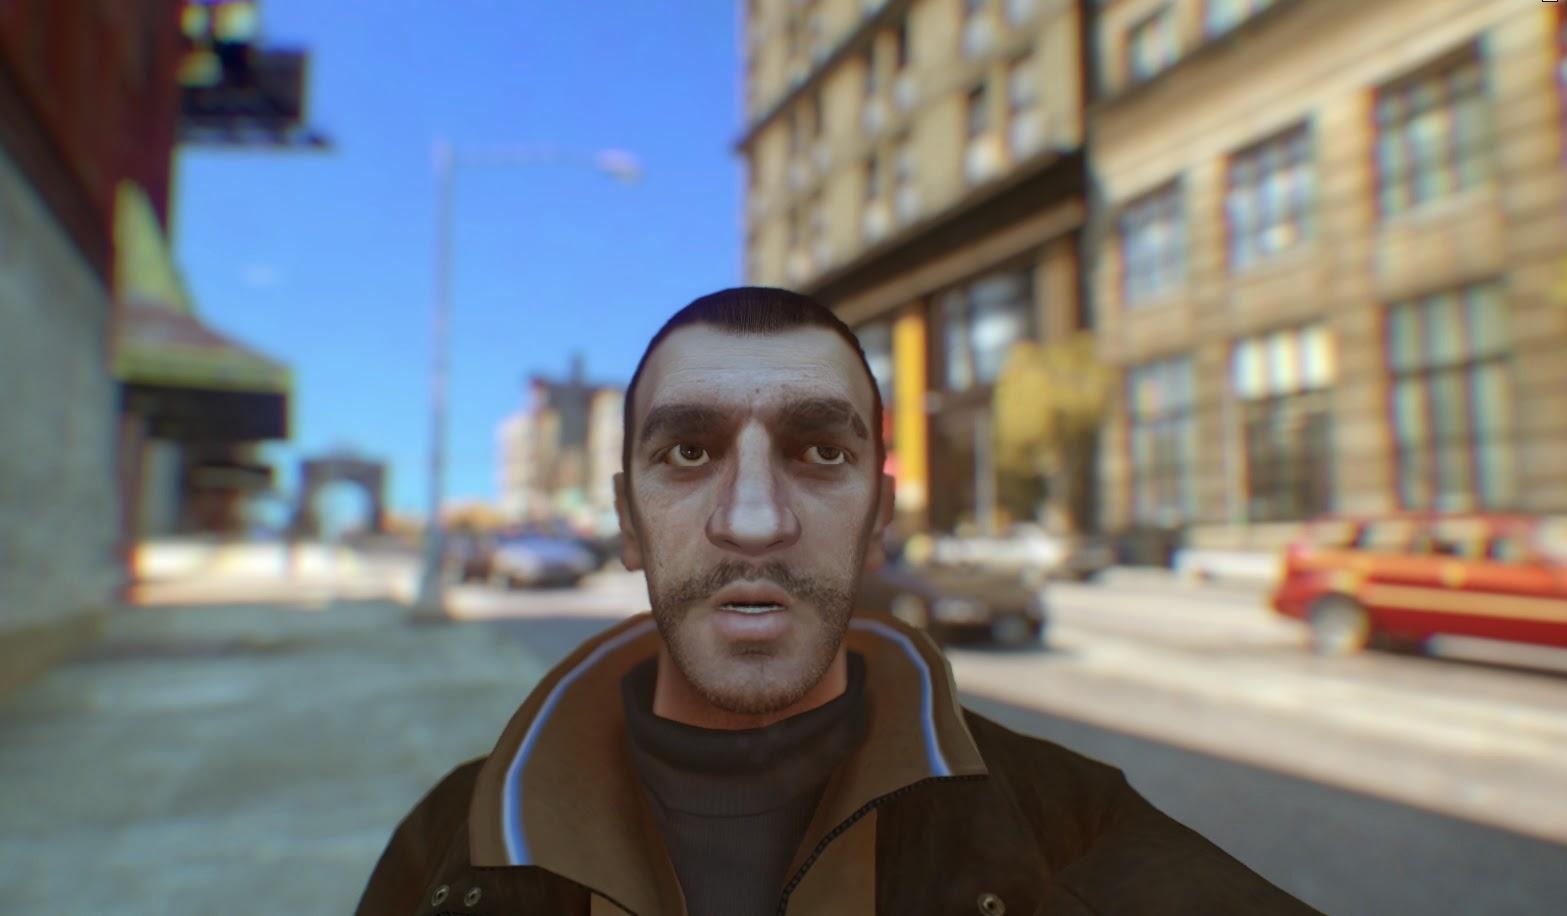 GTA X Scripting: GTA IV Selfie Mod